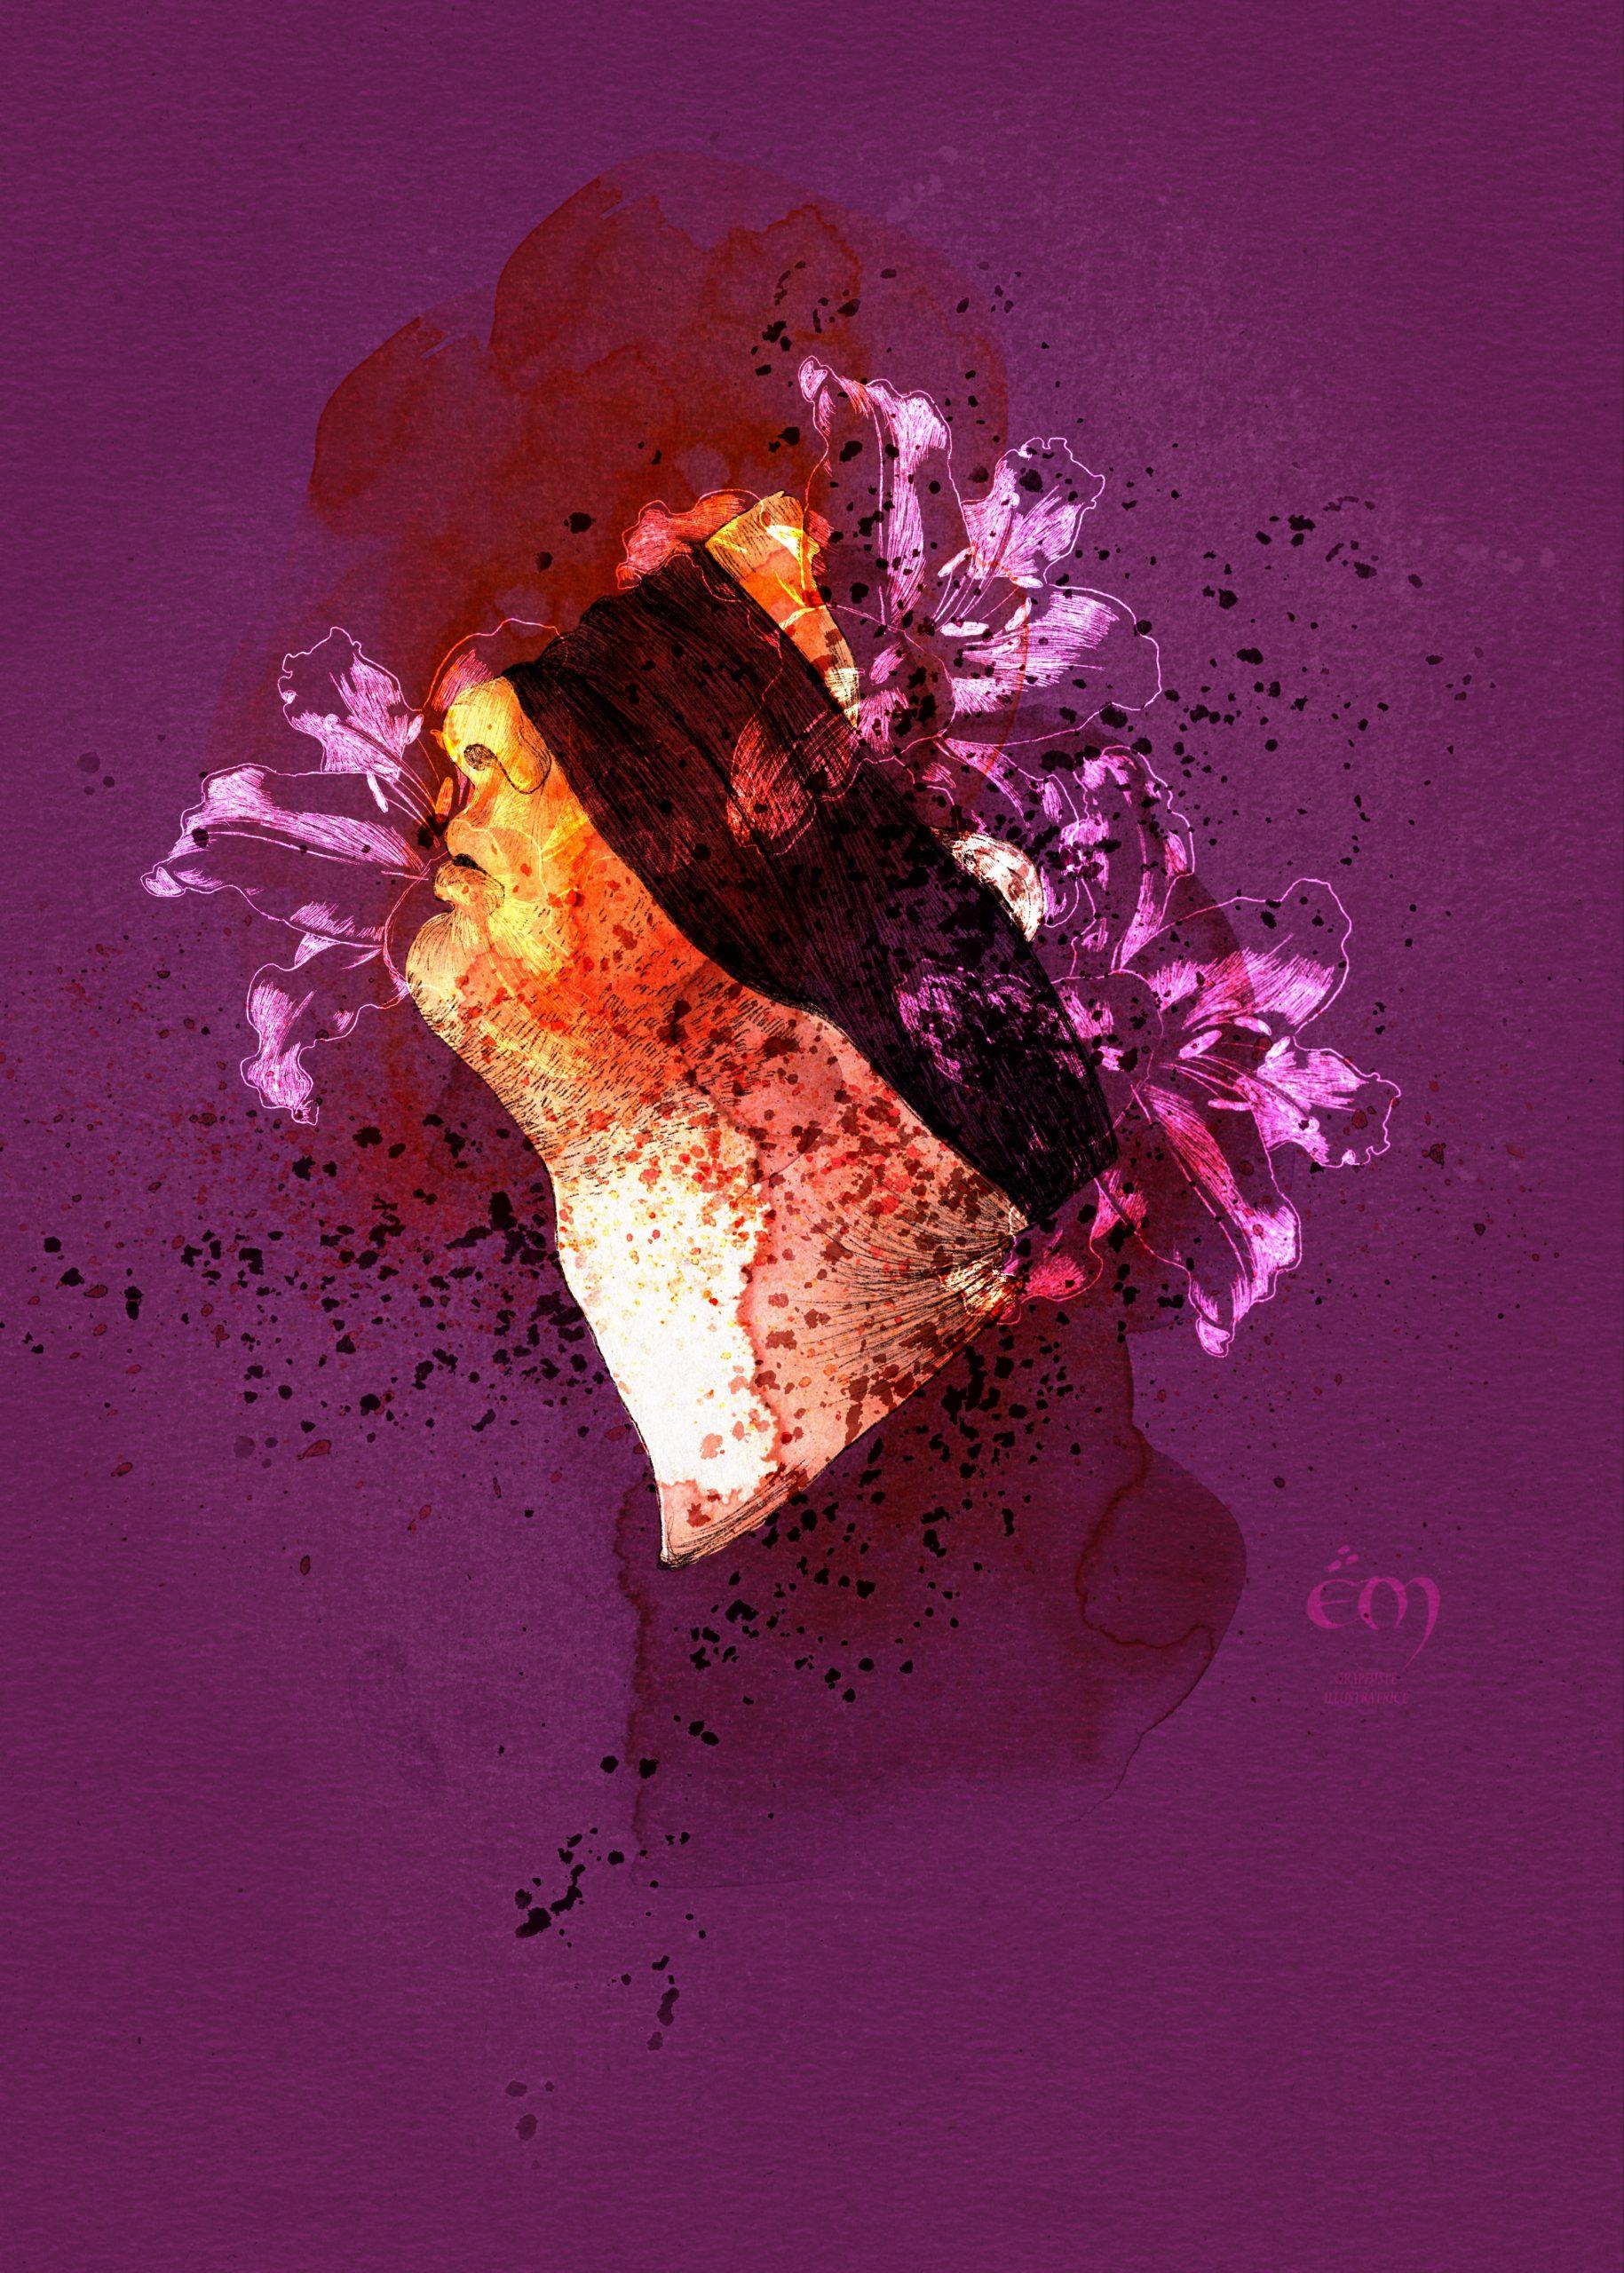 PORTRAIT / JUSTICE IS BLIND  digital painting, aquarelle, dessin